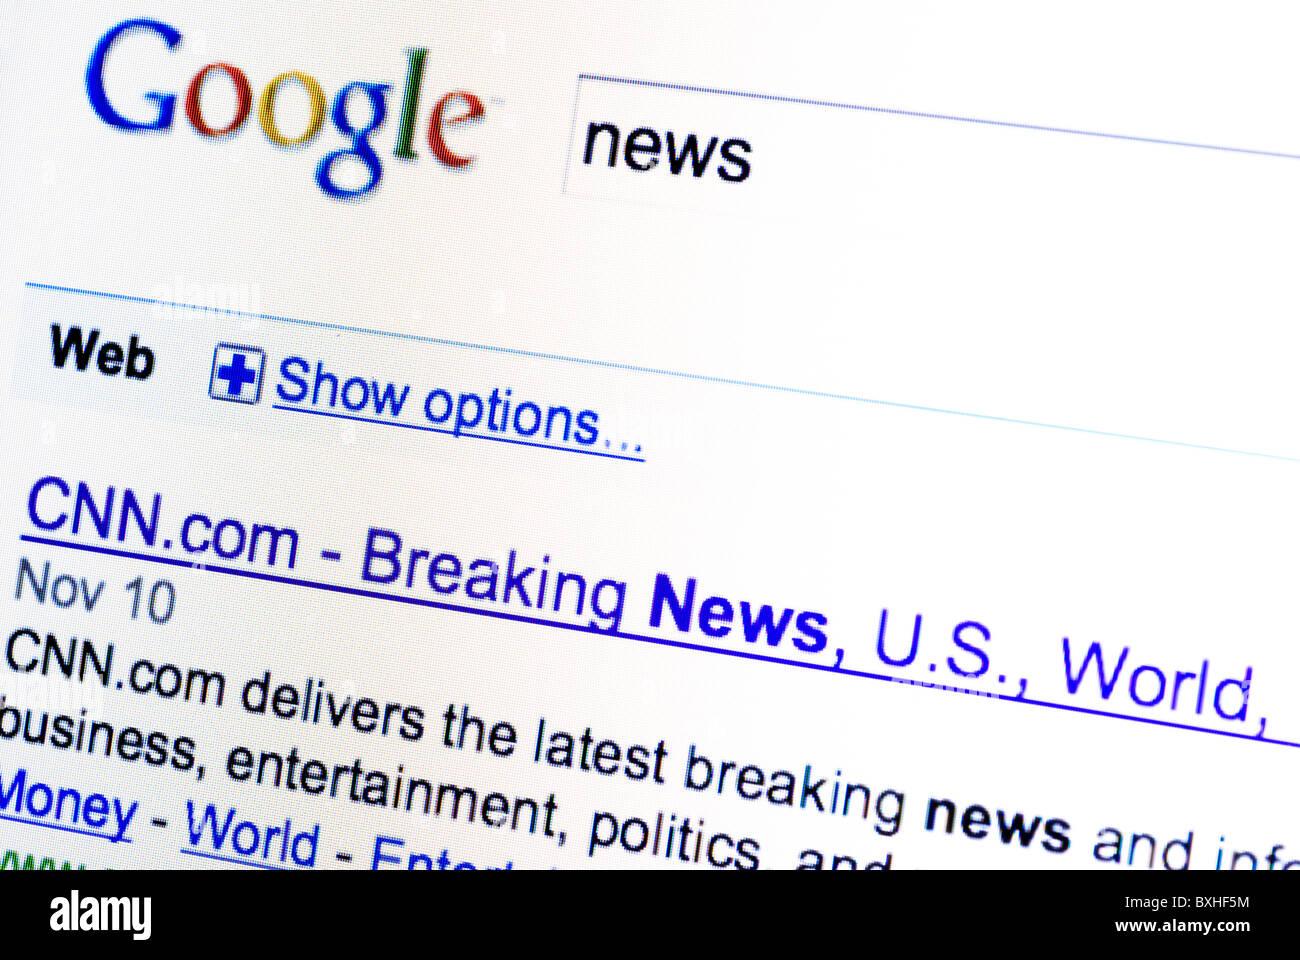 Cnn Breaking News Stock Photos & Cnn Breaking News Stock